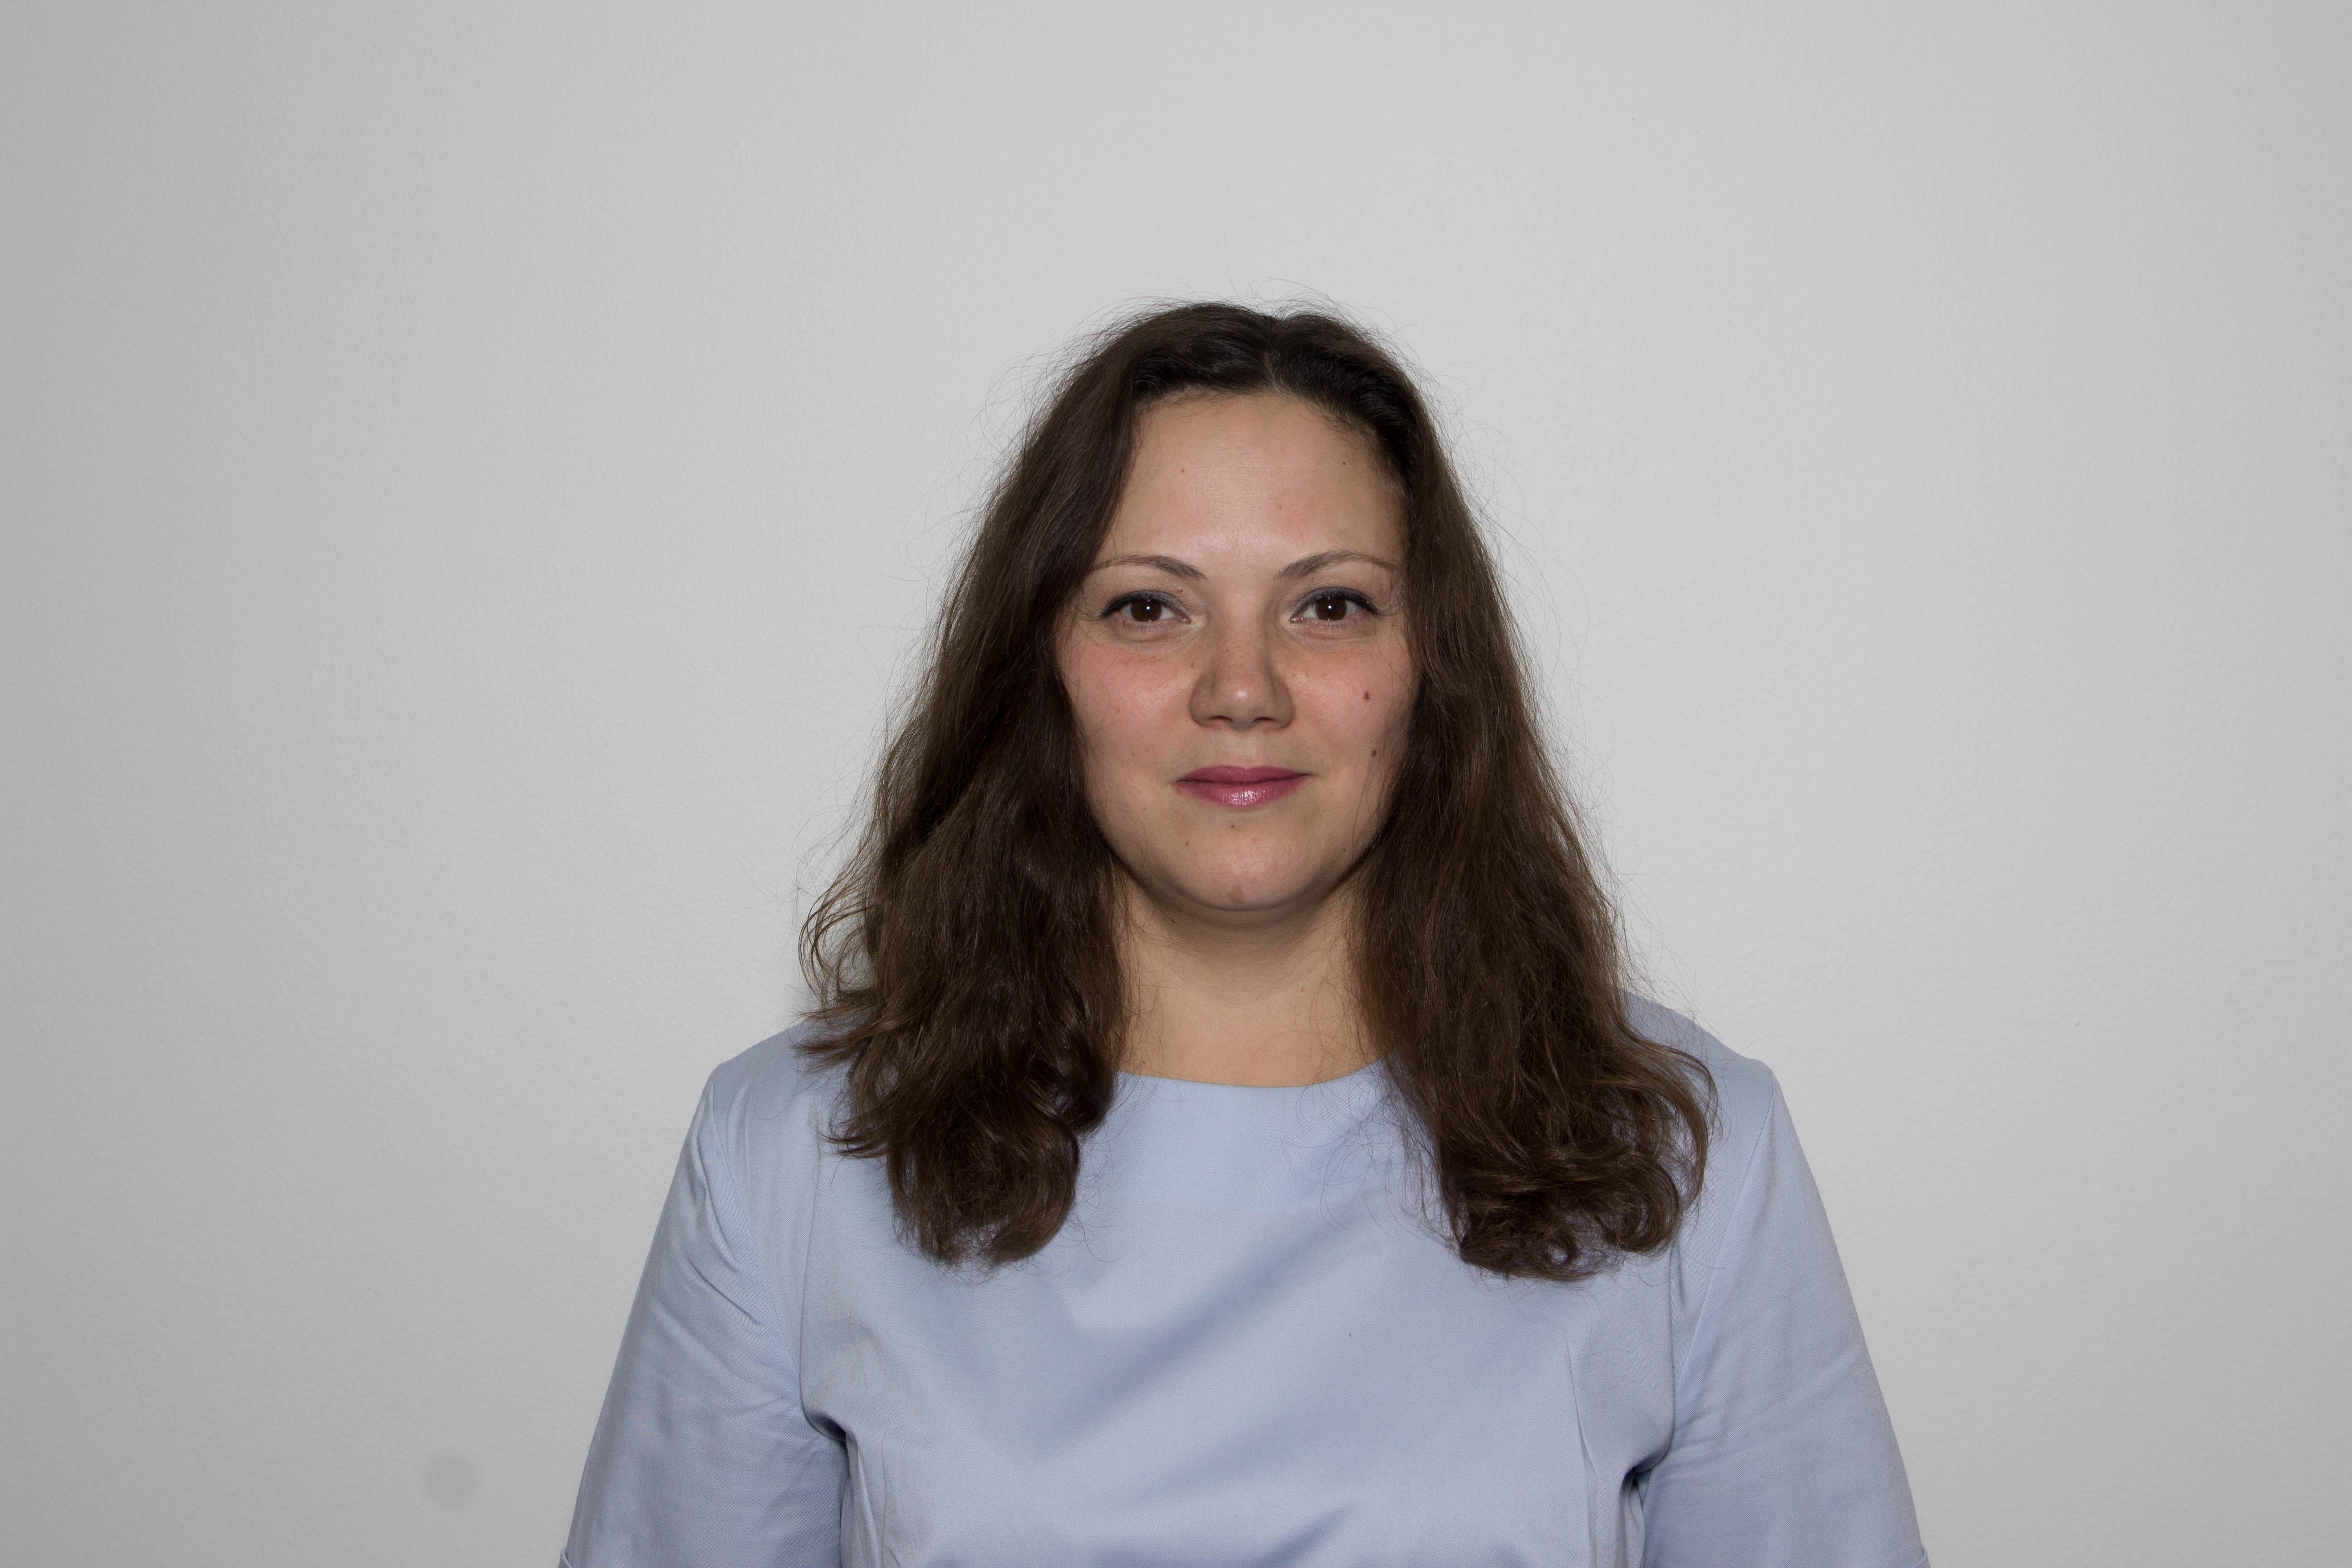 Шафурина Ирина - старший администратор